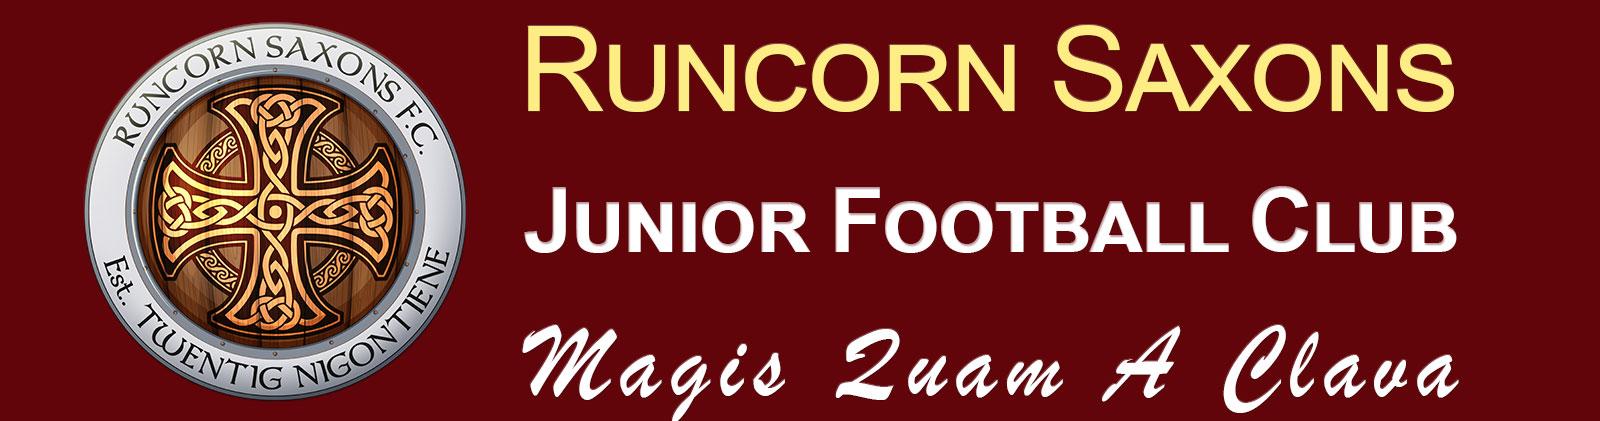 Runcorn Saxons Junior Football Club logo